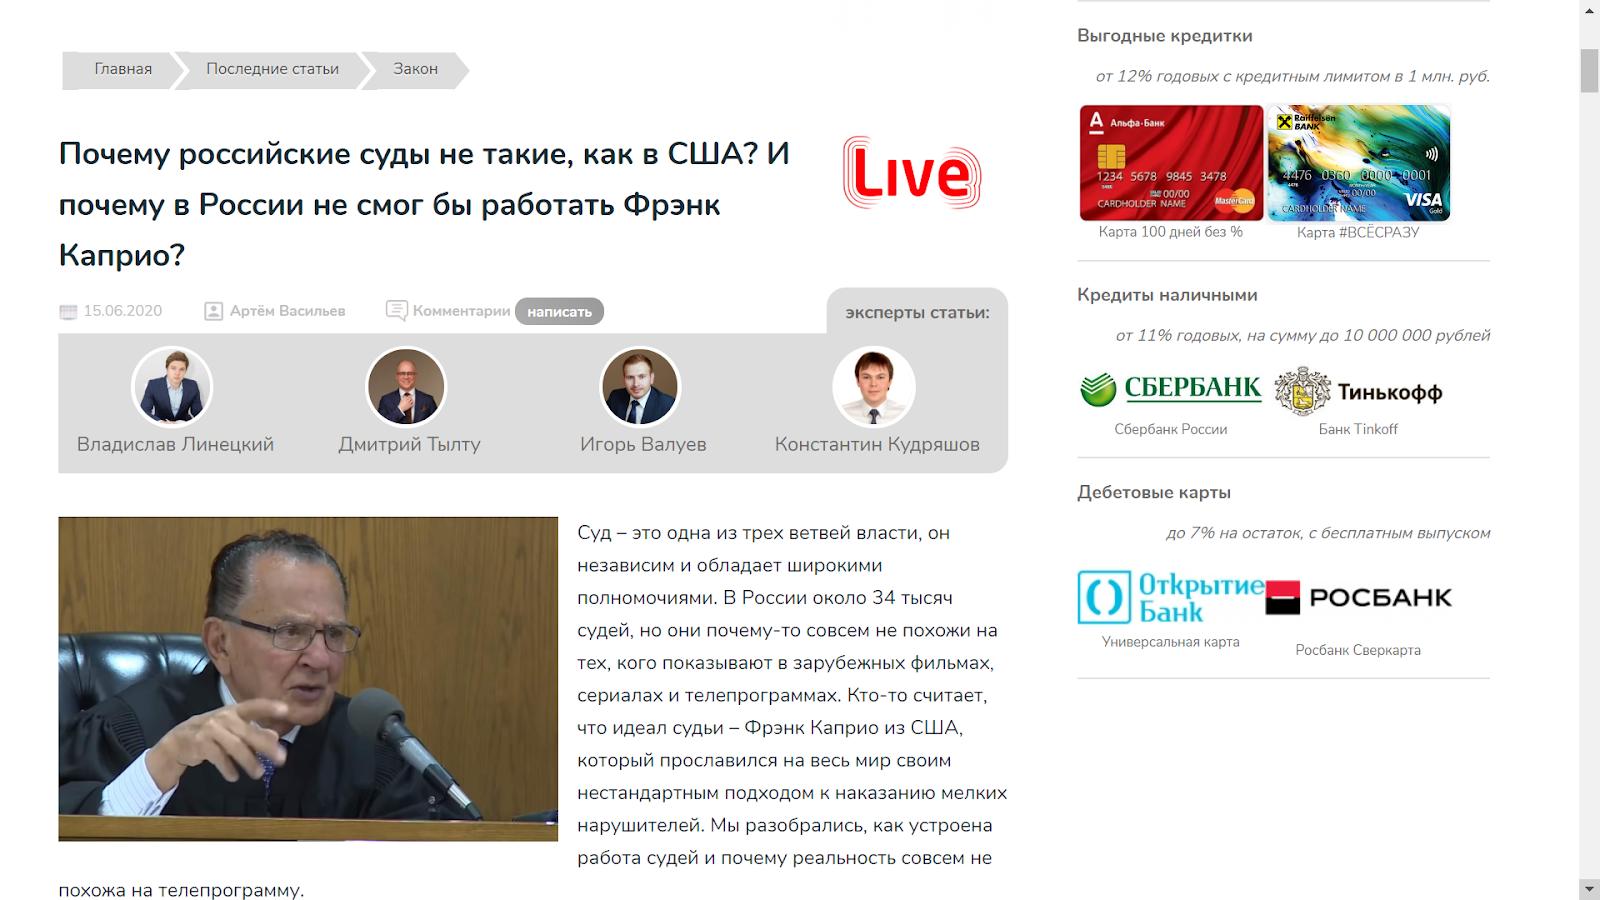 Адвокат Кудряшов Константин Александрович в СМИ